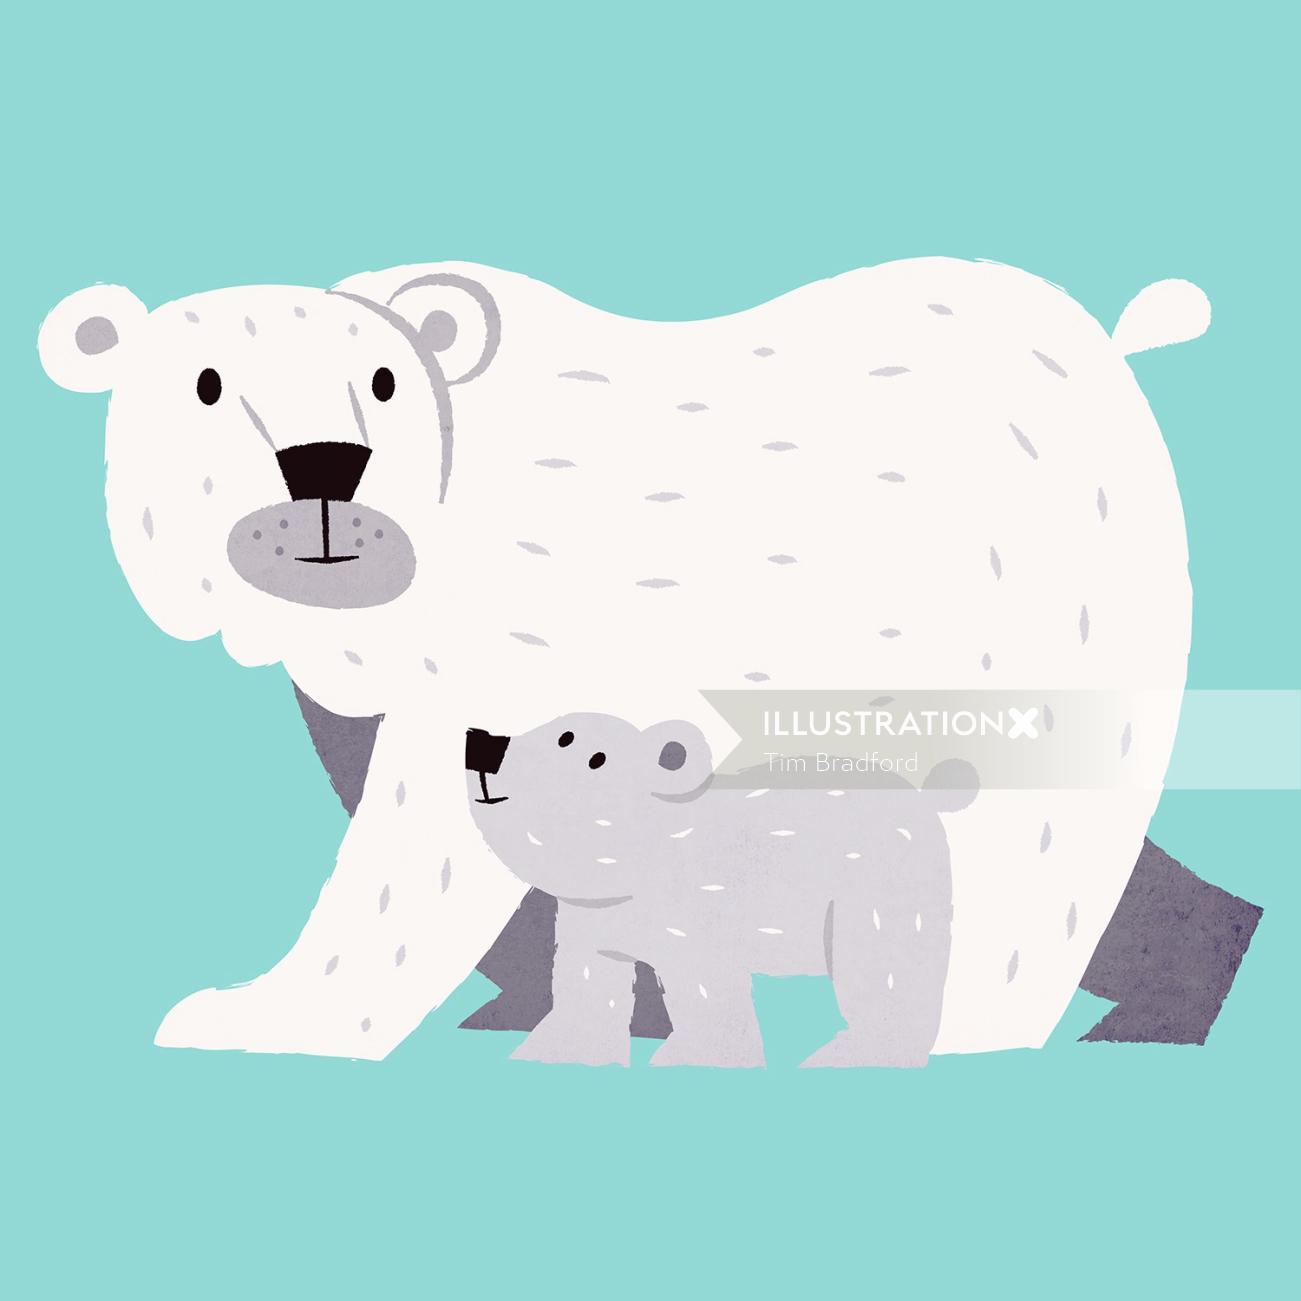 Animals illustration of bear and cub